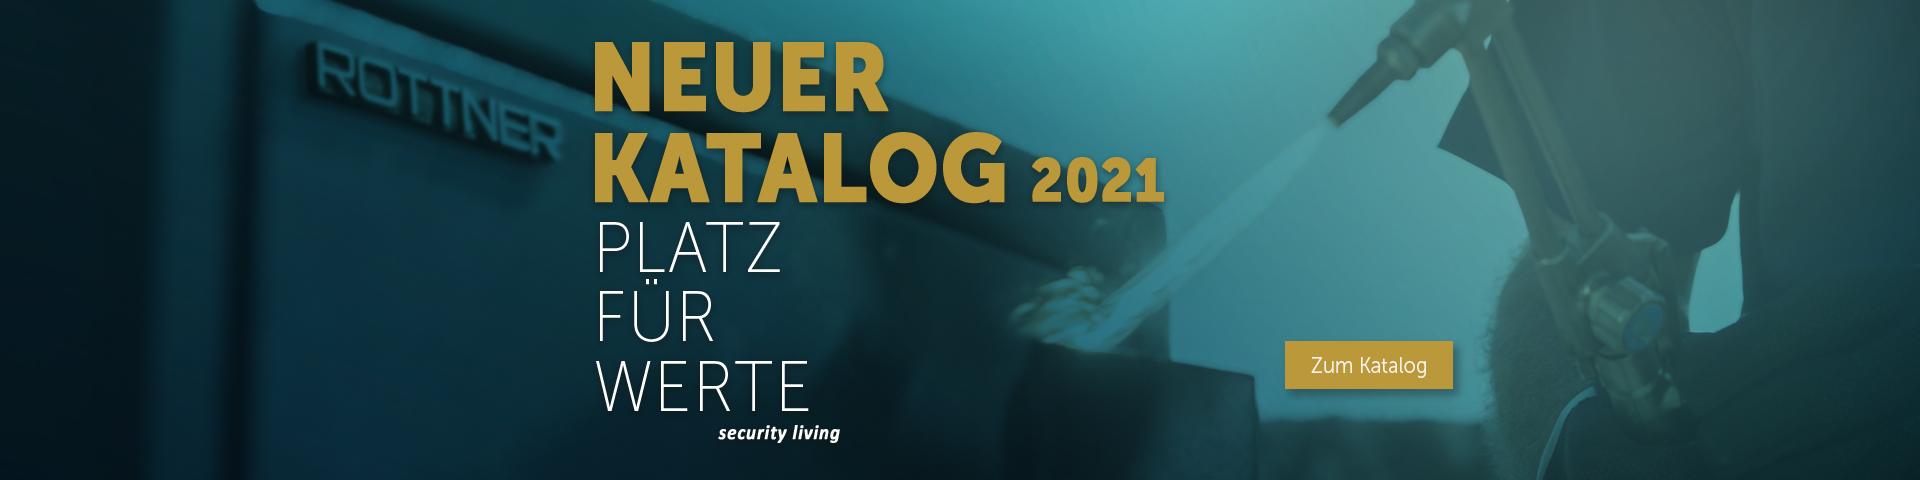 Neuer Rottner Katalog 2021